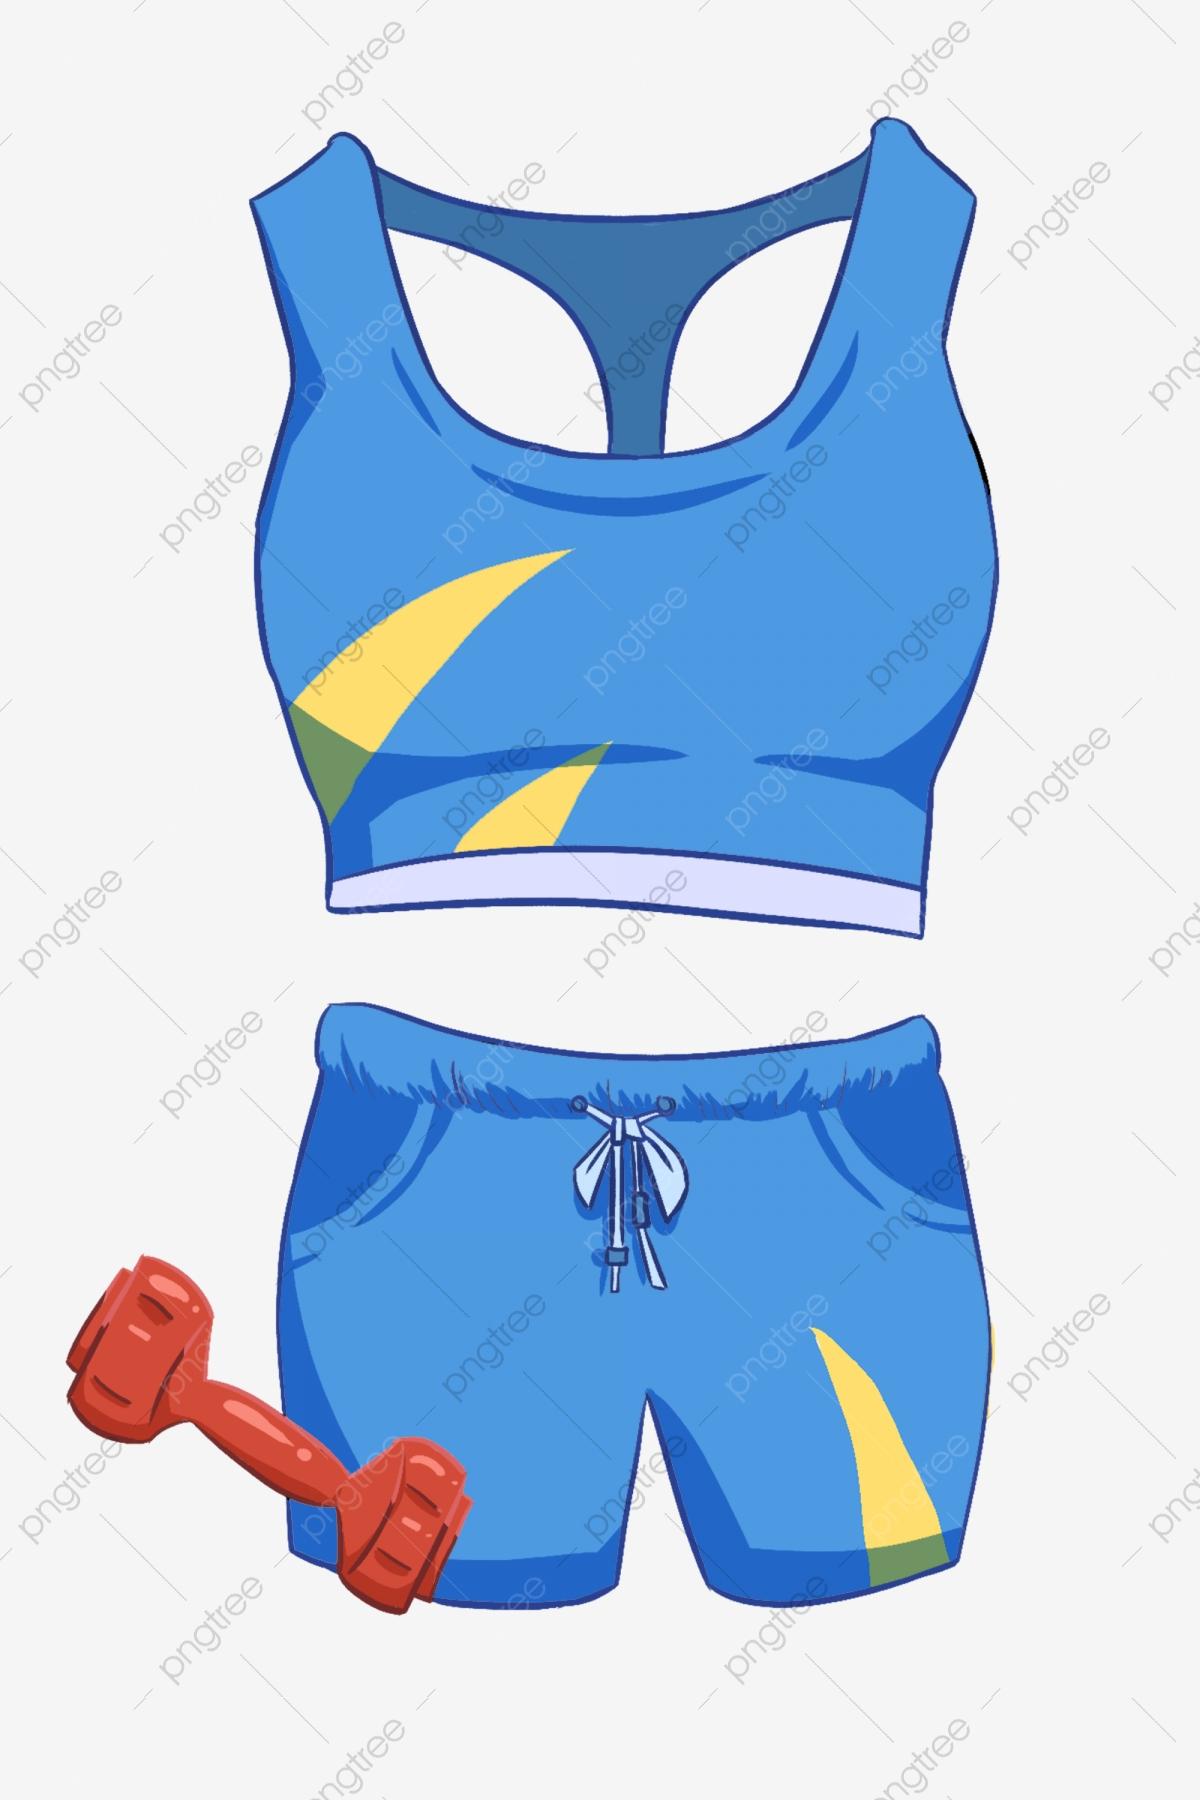 Blue fitness dress illustration. Movement clipart gym clothes